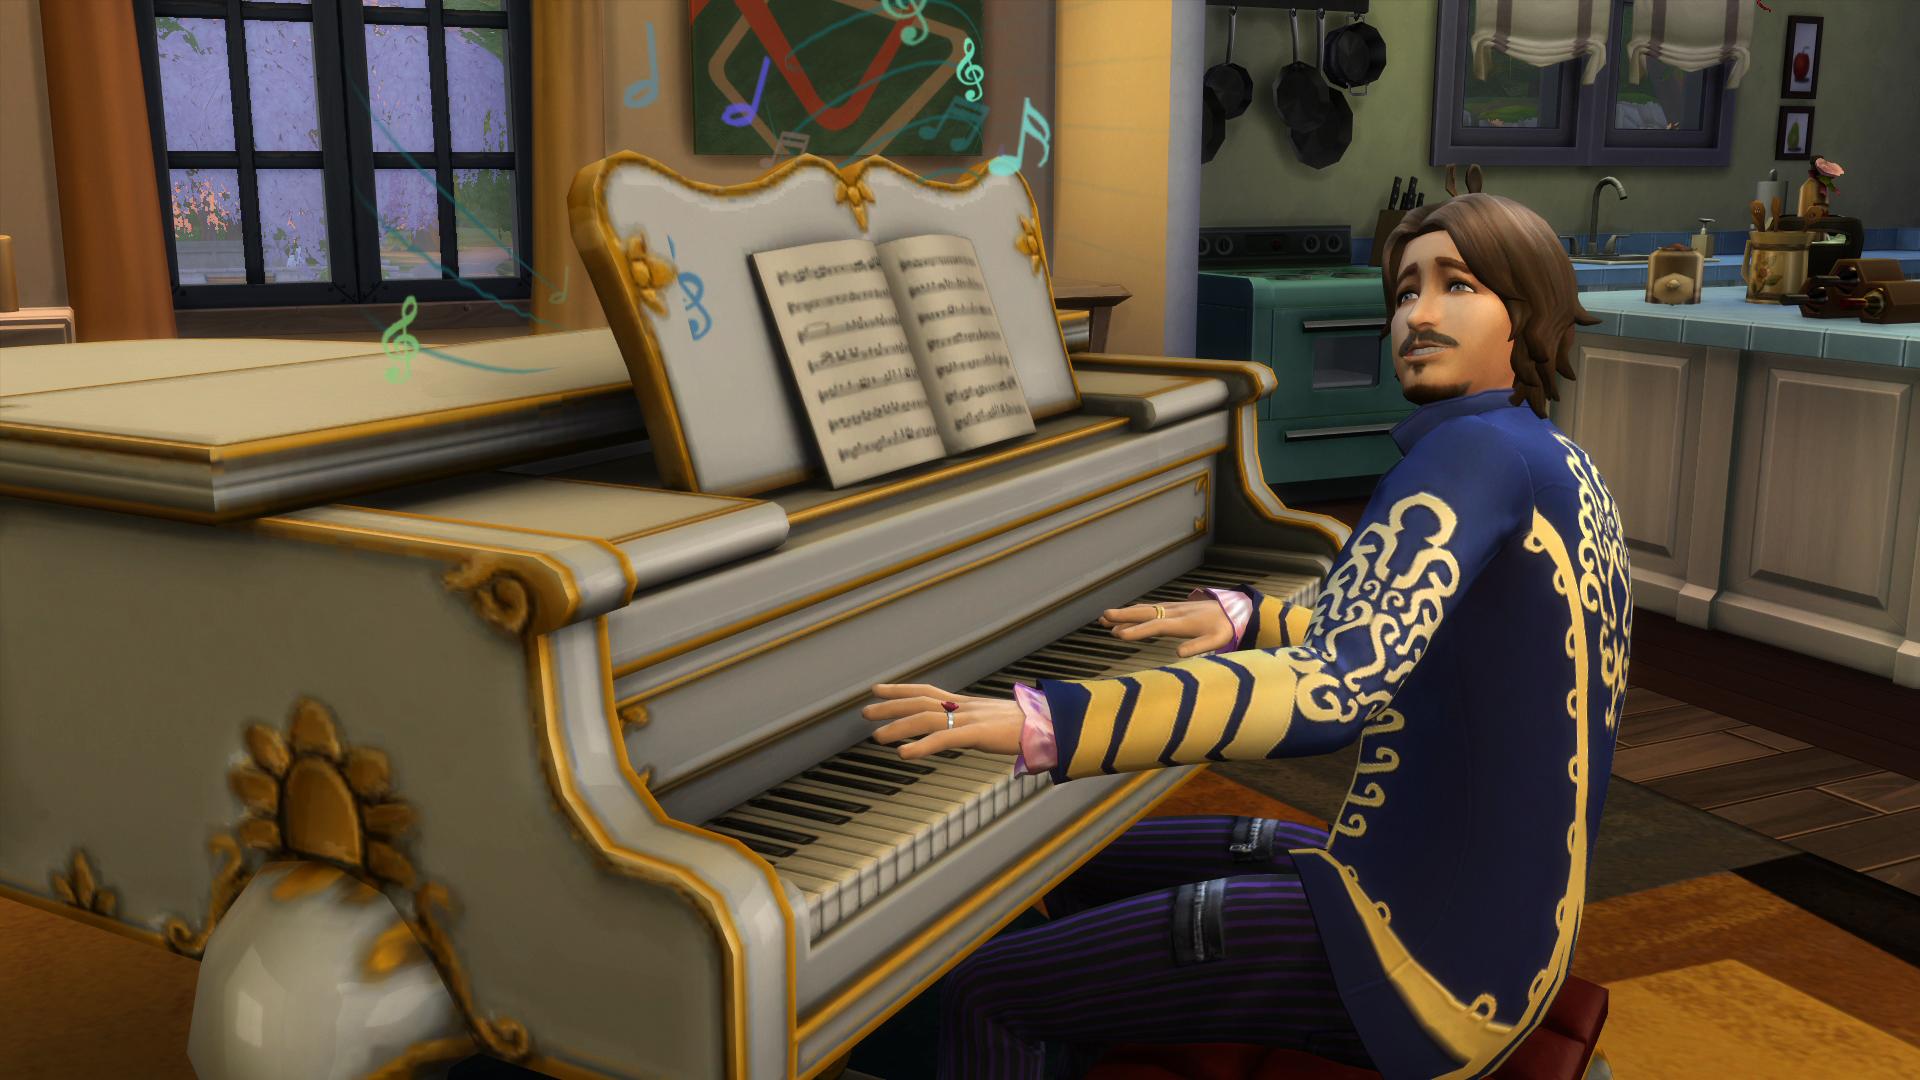 Les Sims 4 43.png